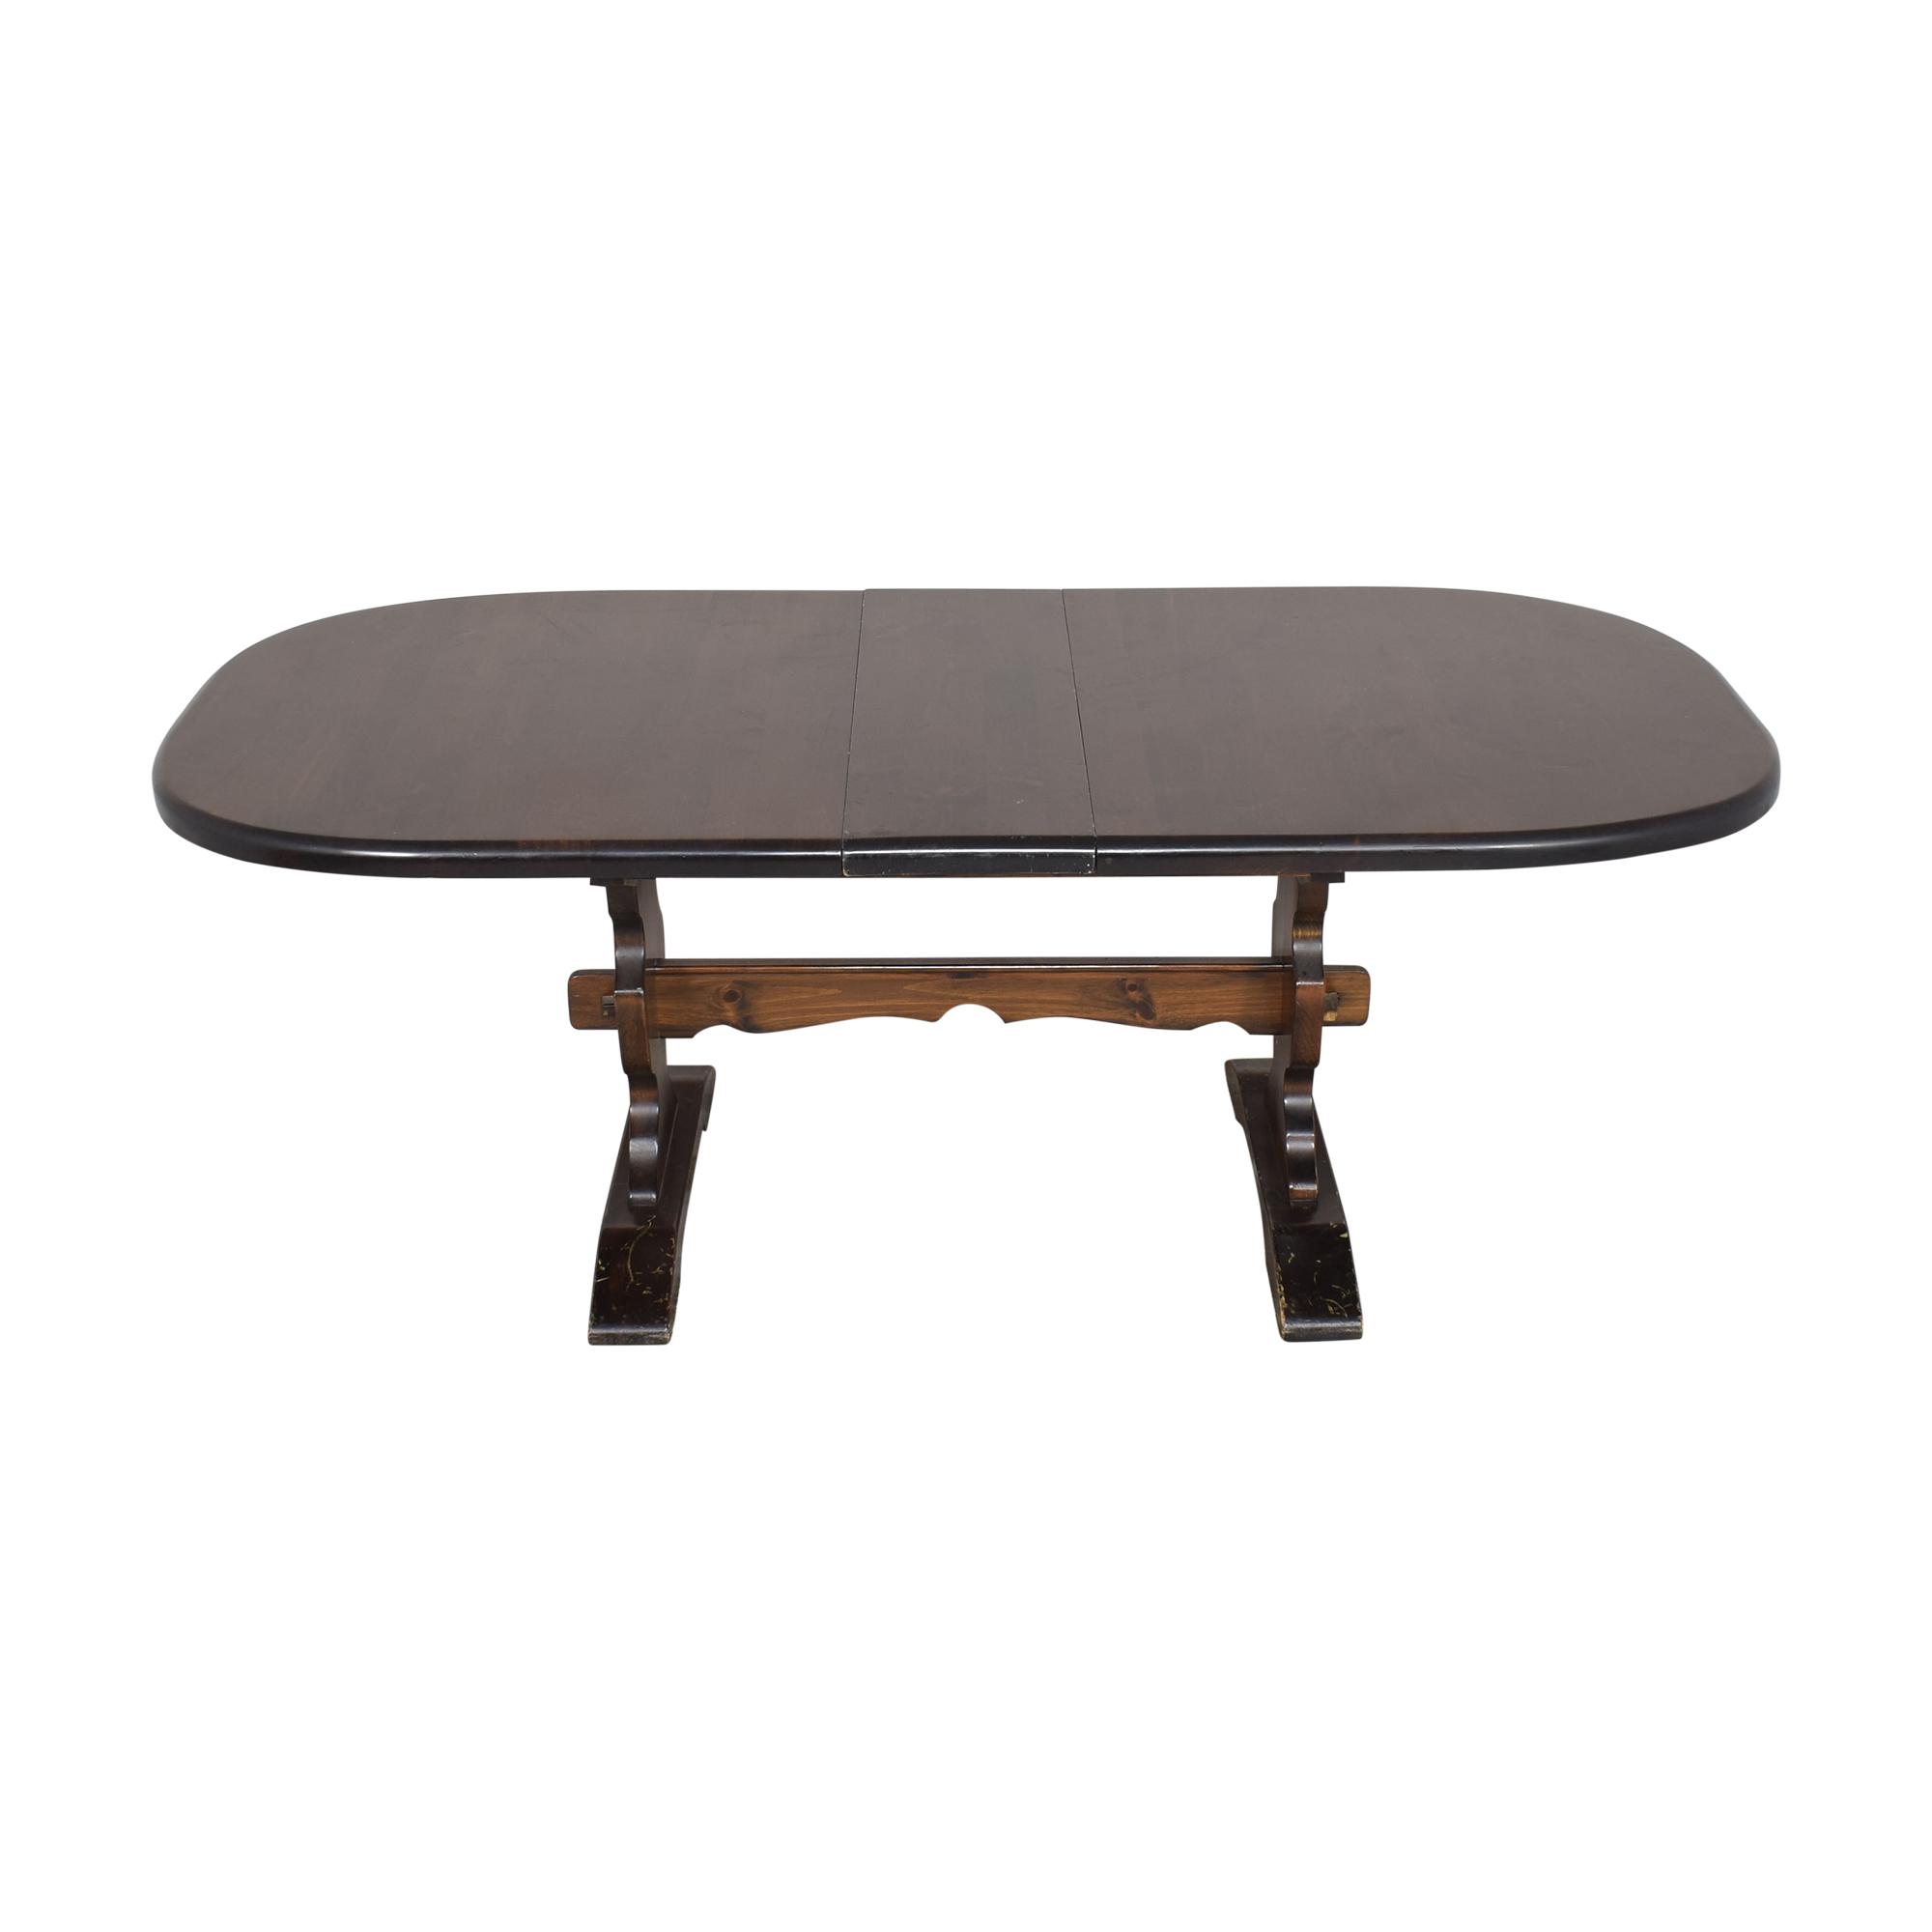 Bennington Pine Bennington Pine Extendable Trestle Dining Table ct